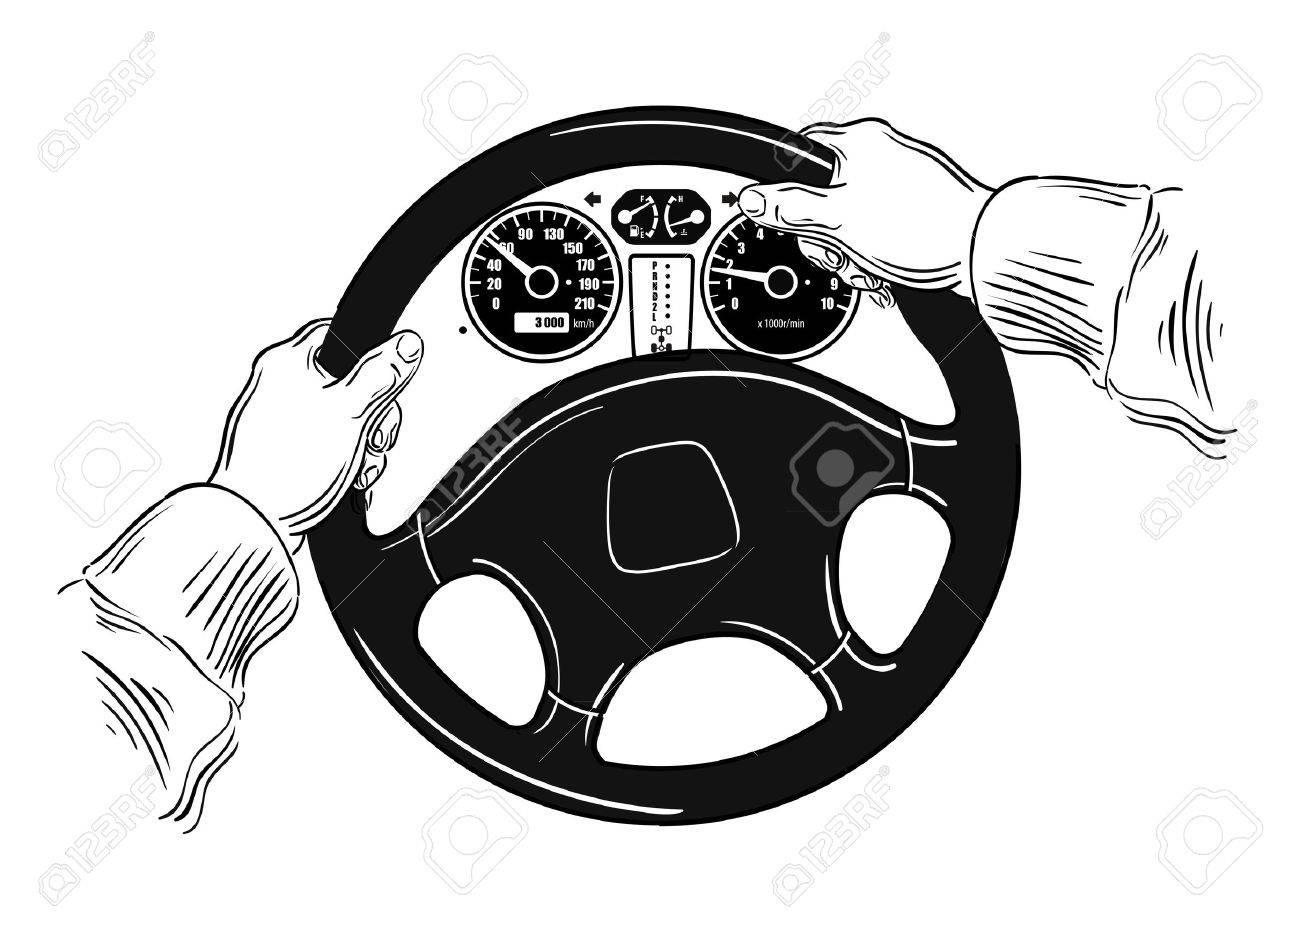 hand drawn car wheel. - 49946851